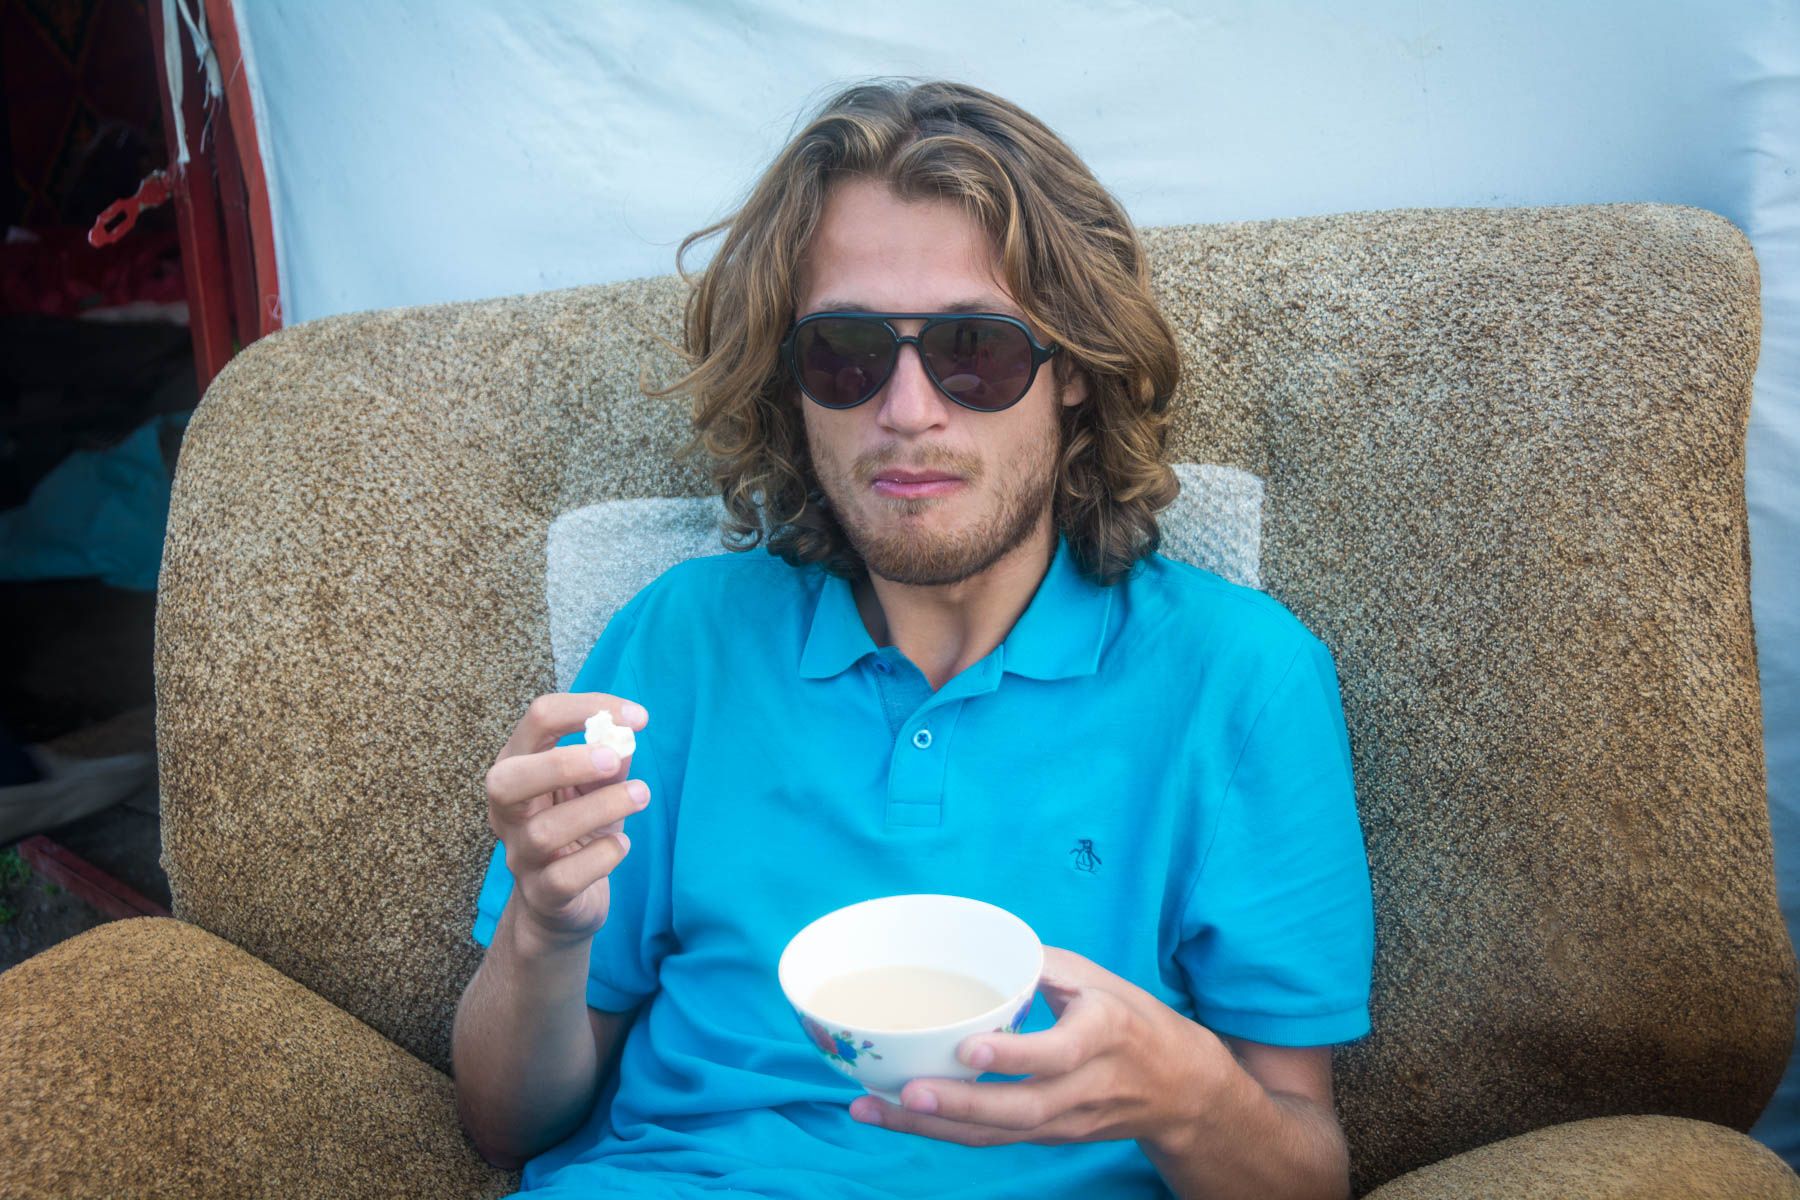 Sebastiaan does not enjoy the weird milk Kazakh snacks - Lost With Purpose